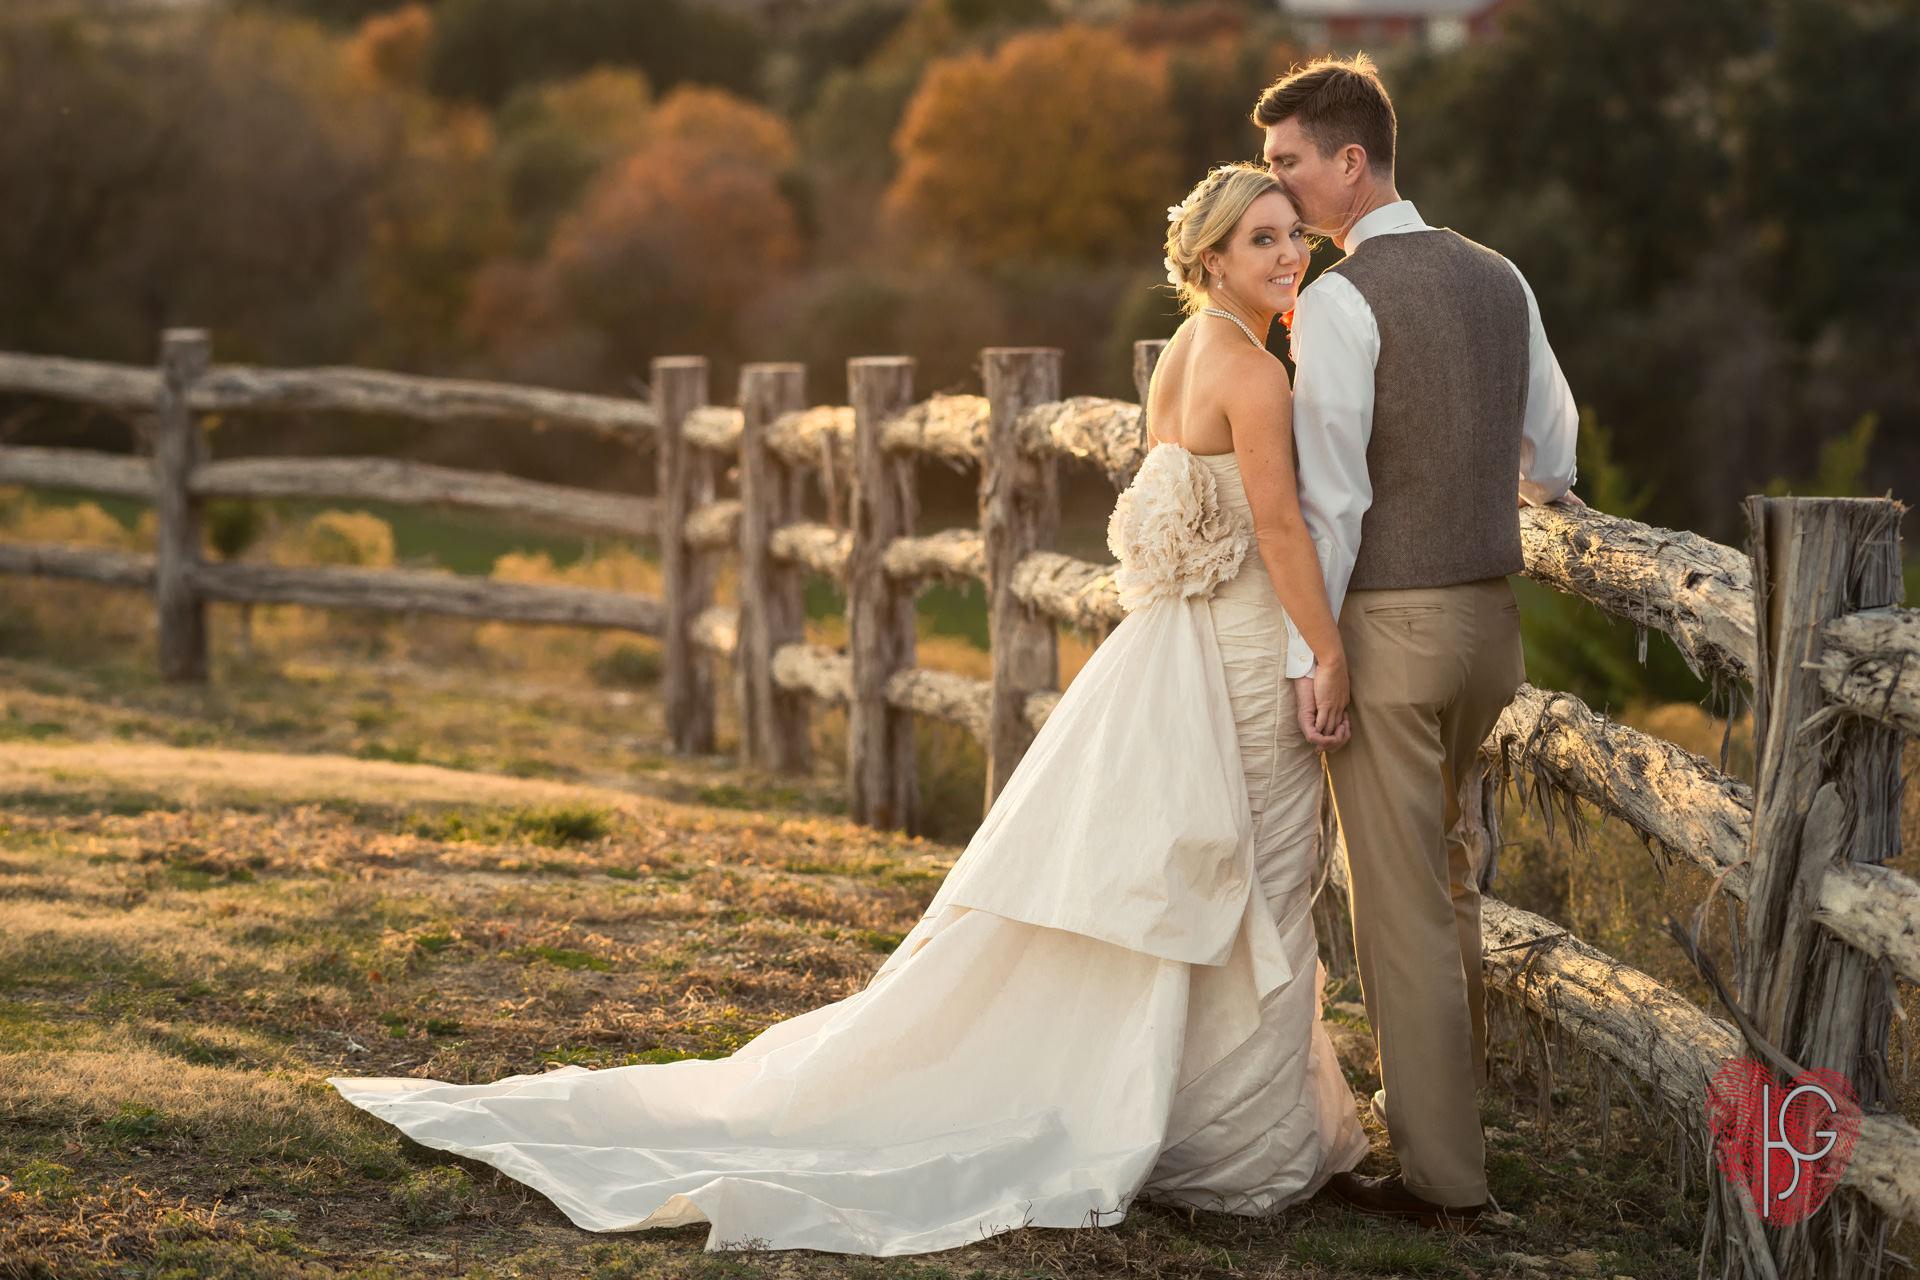 Romantic wedding photos of couple